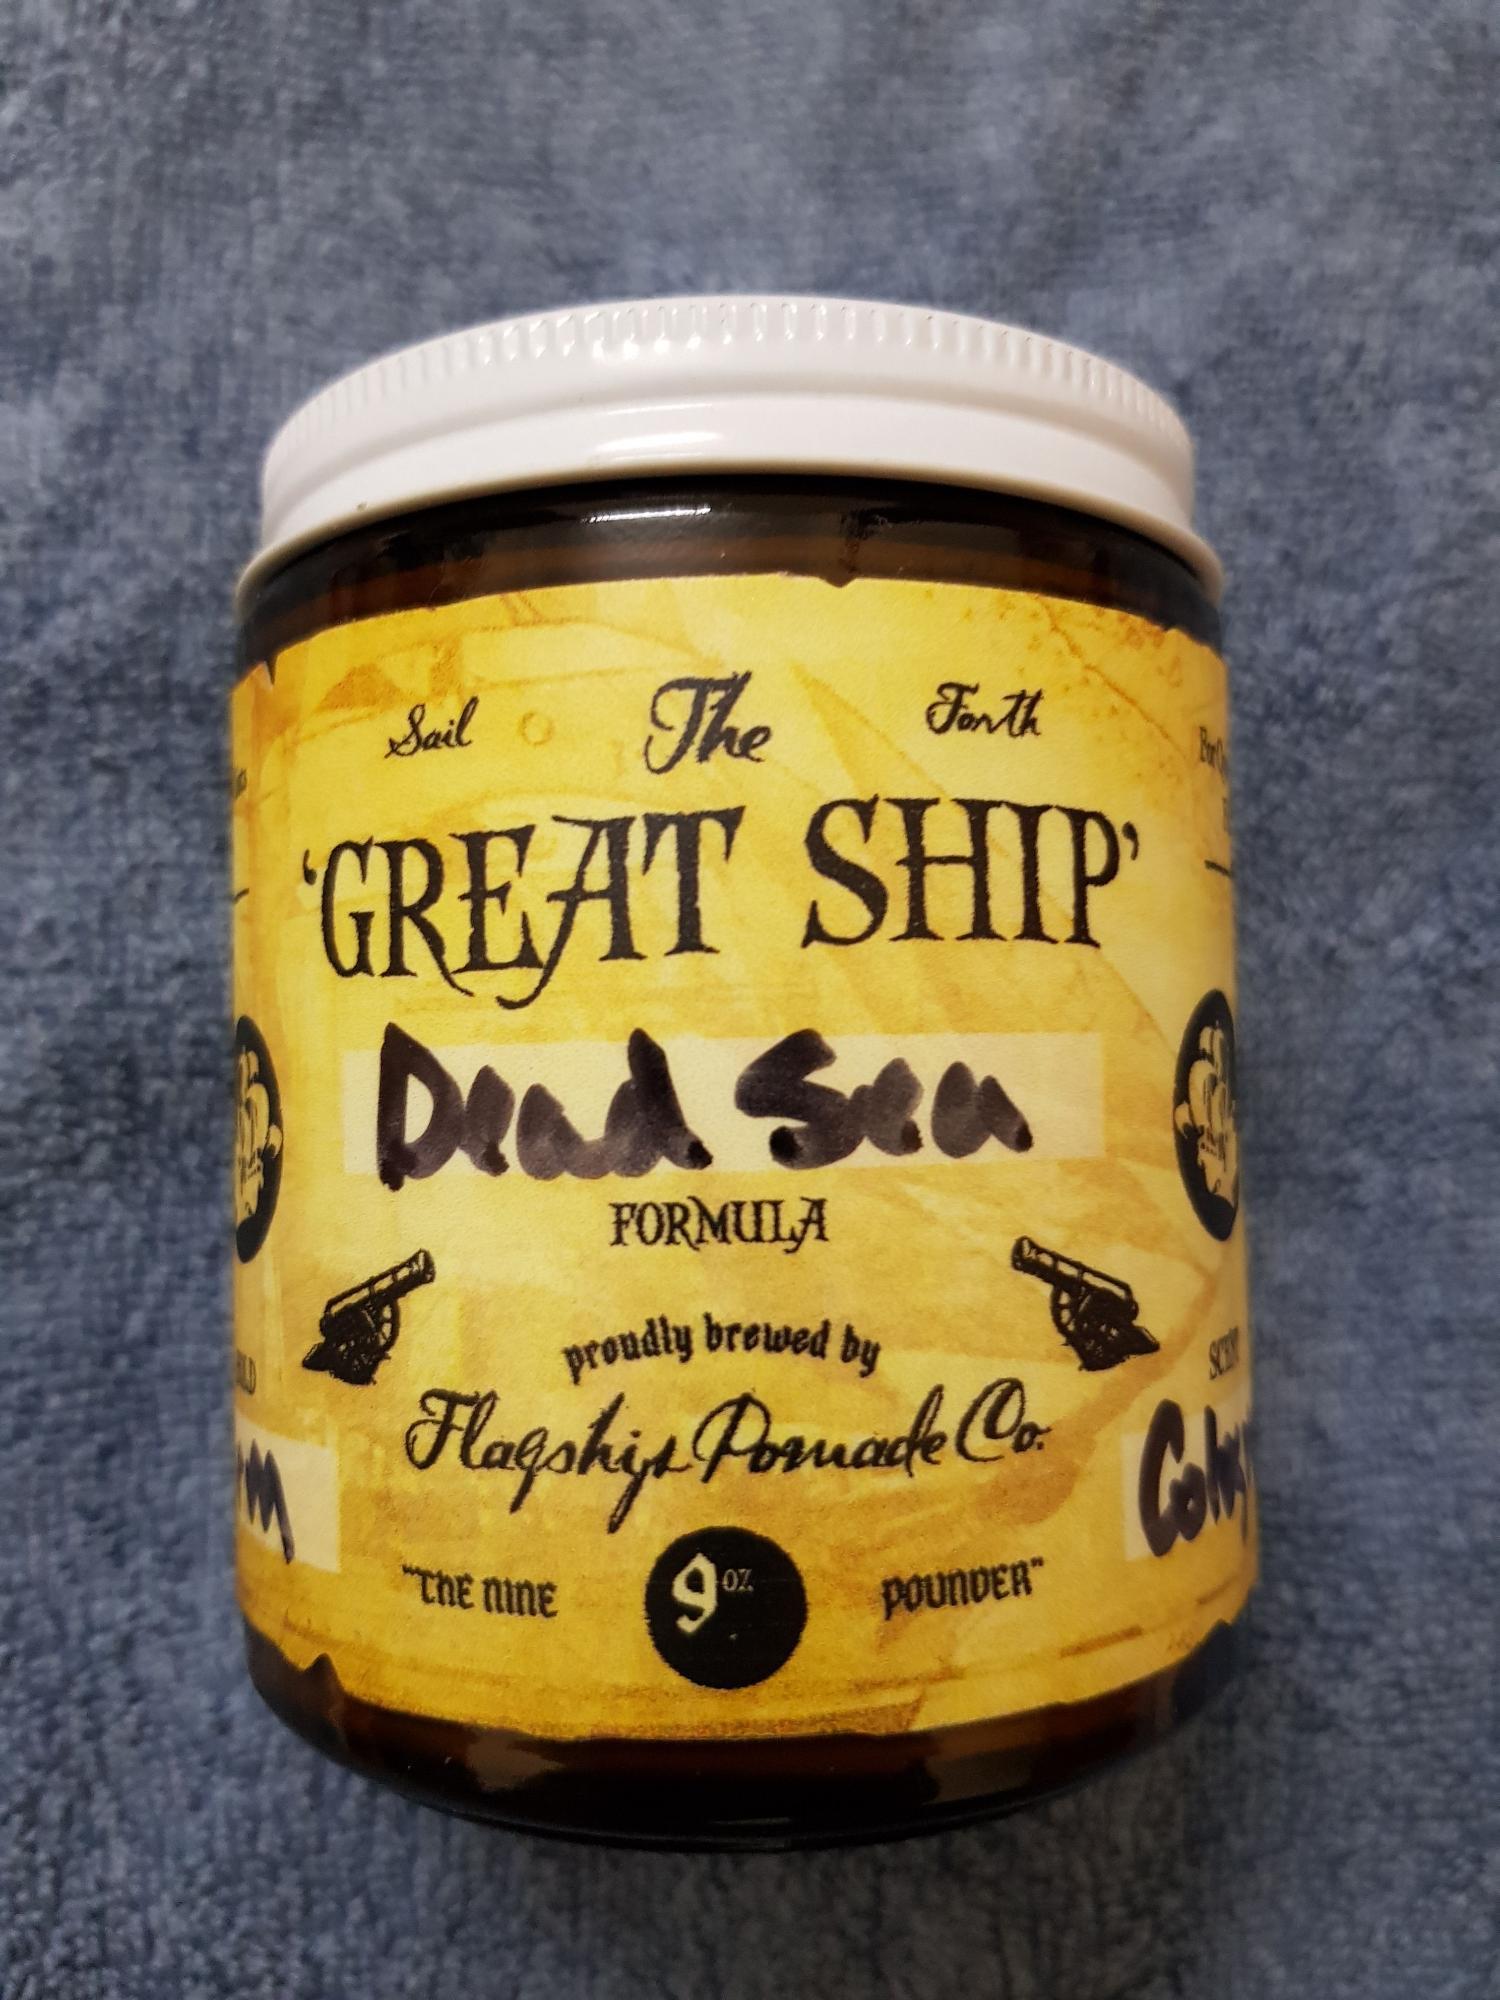 Giá Bán Sap Vuốt Toc Greatship Deadsea Mới Rẻ